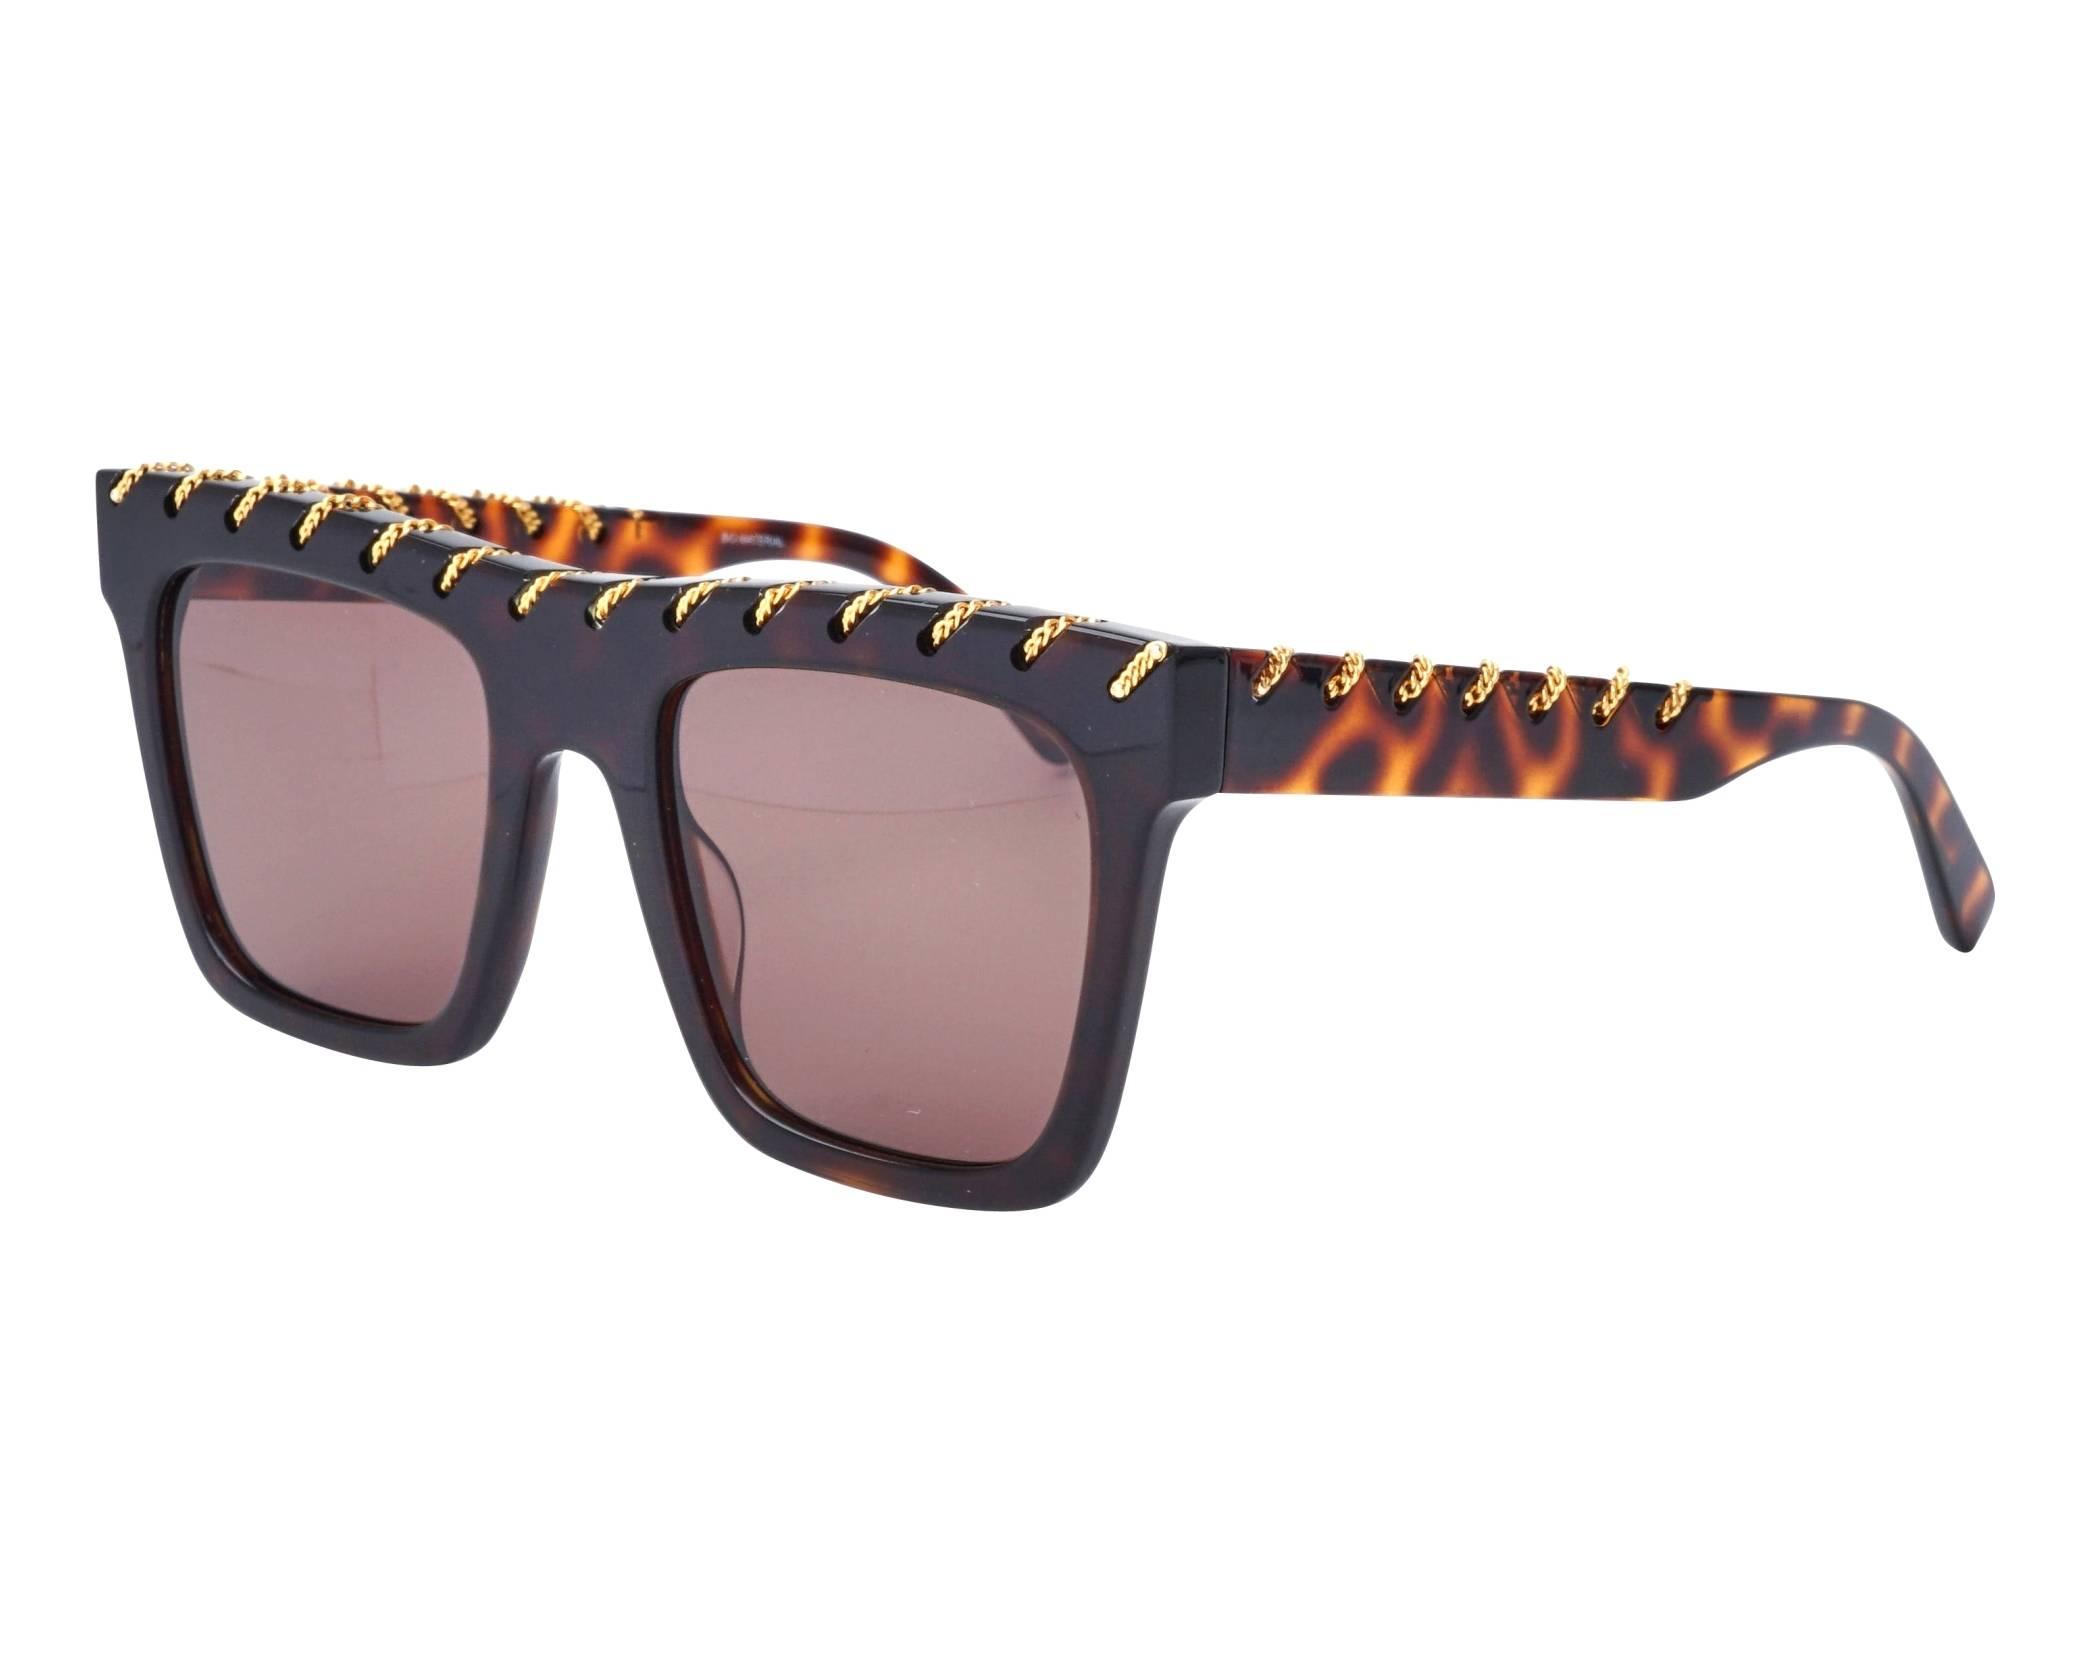 e3d6bf30a0 Sunglasses Stella McCartney SC-0128-S 002 51-21 Havana Gold profile view